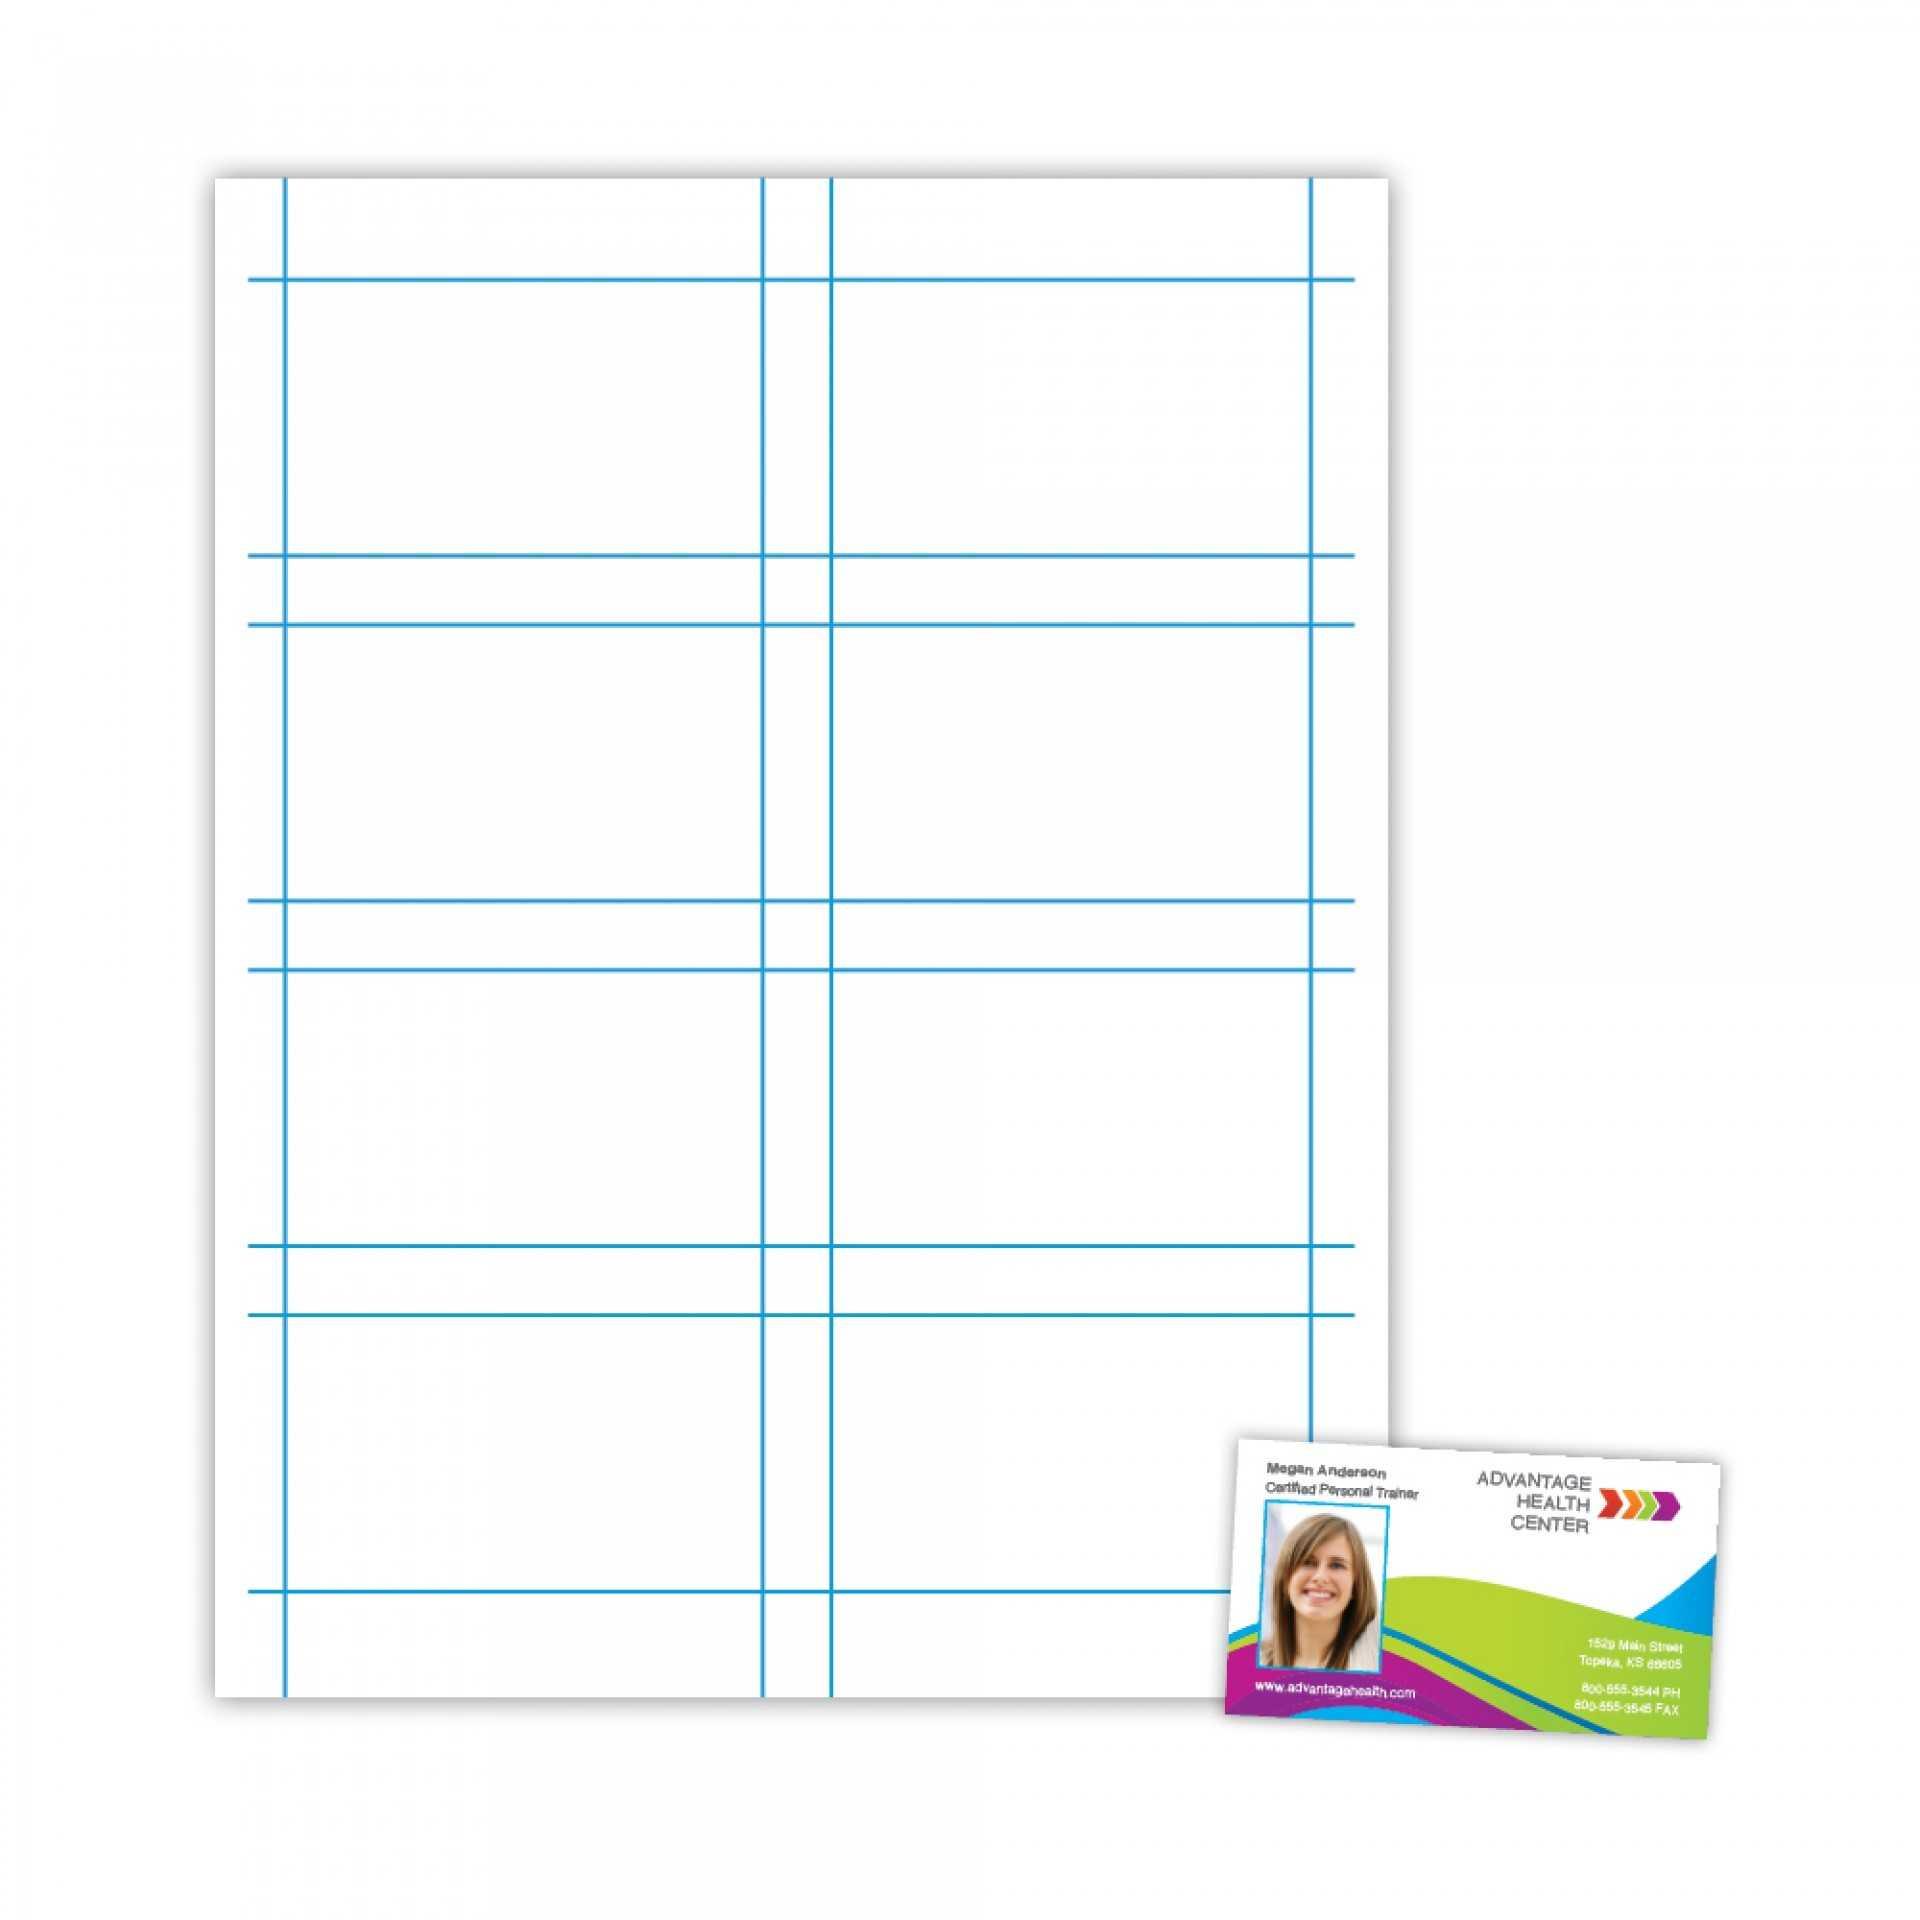 025 Plain Business Card Template Blank Microsoft Word Free With Plain Business Card Template Microsoft Word